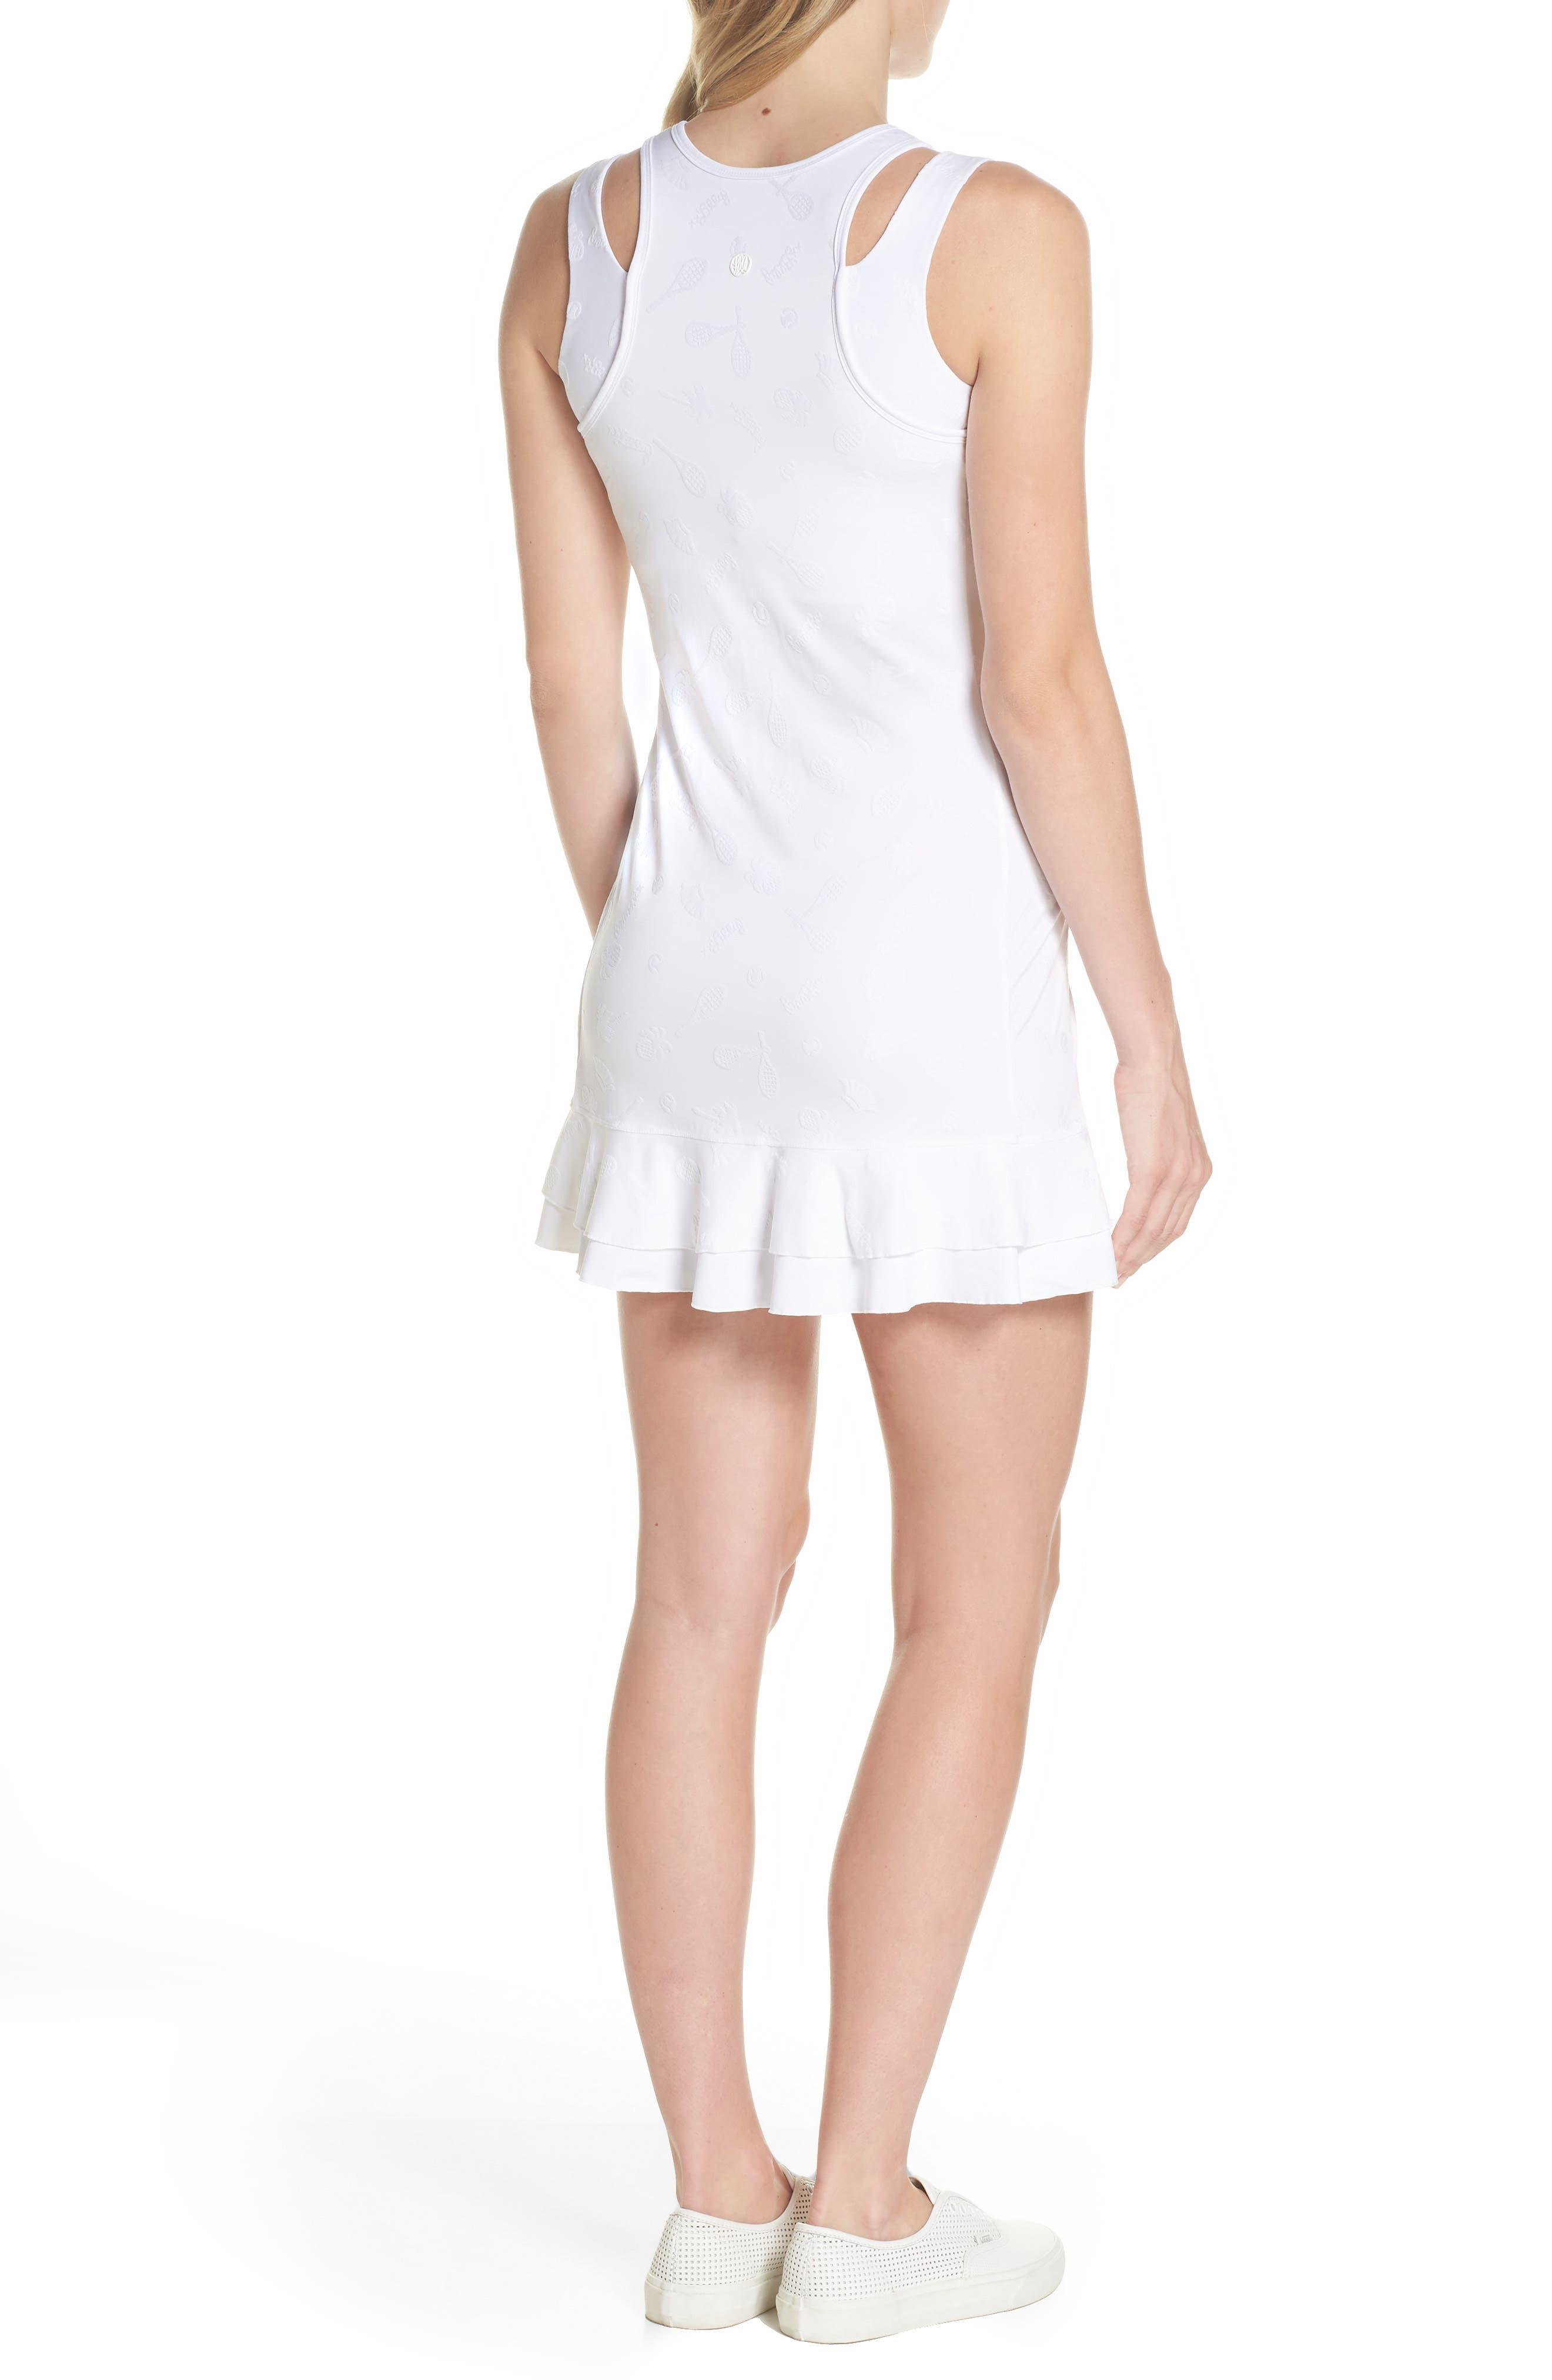 Delphina UPF 50+ Tennis Dress,                             Alternate thumbnail 2, color,                             Resort White Perfect Match Jaq